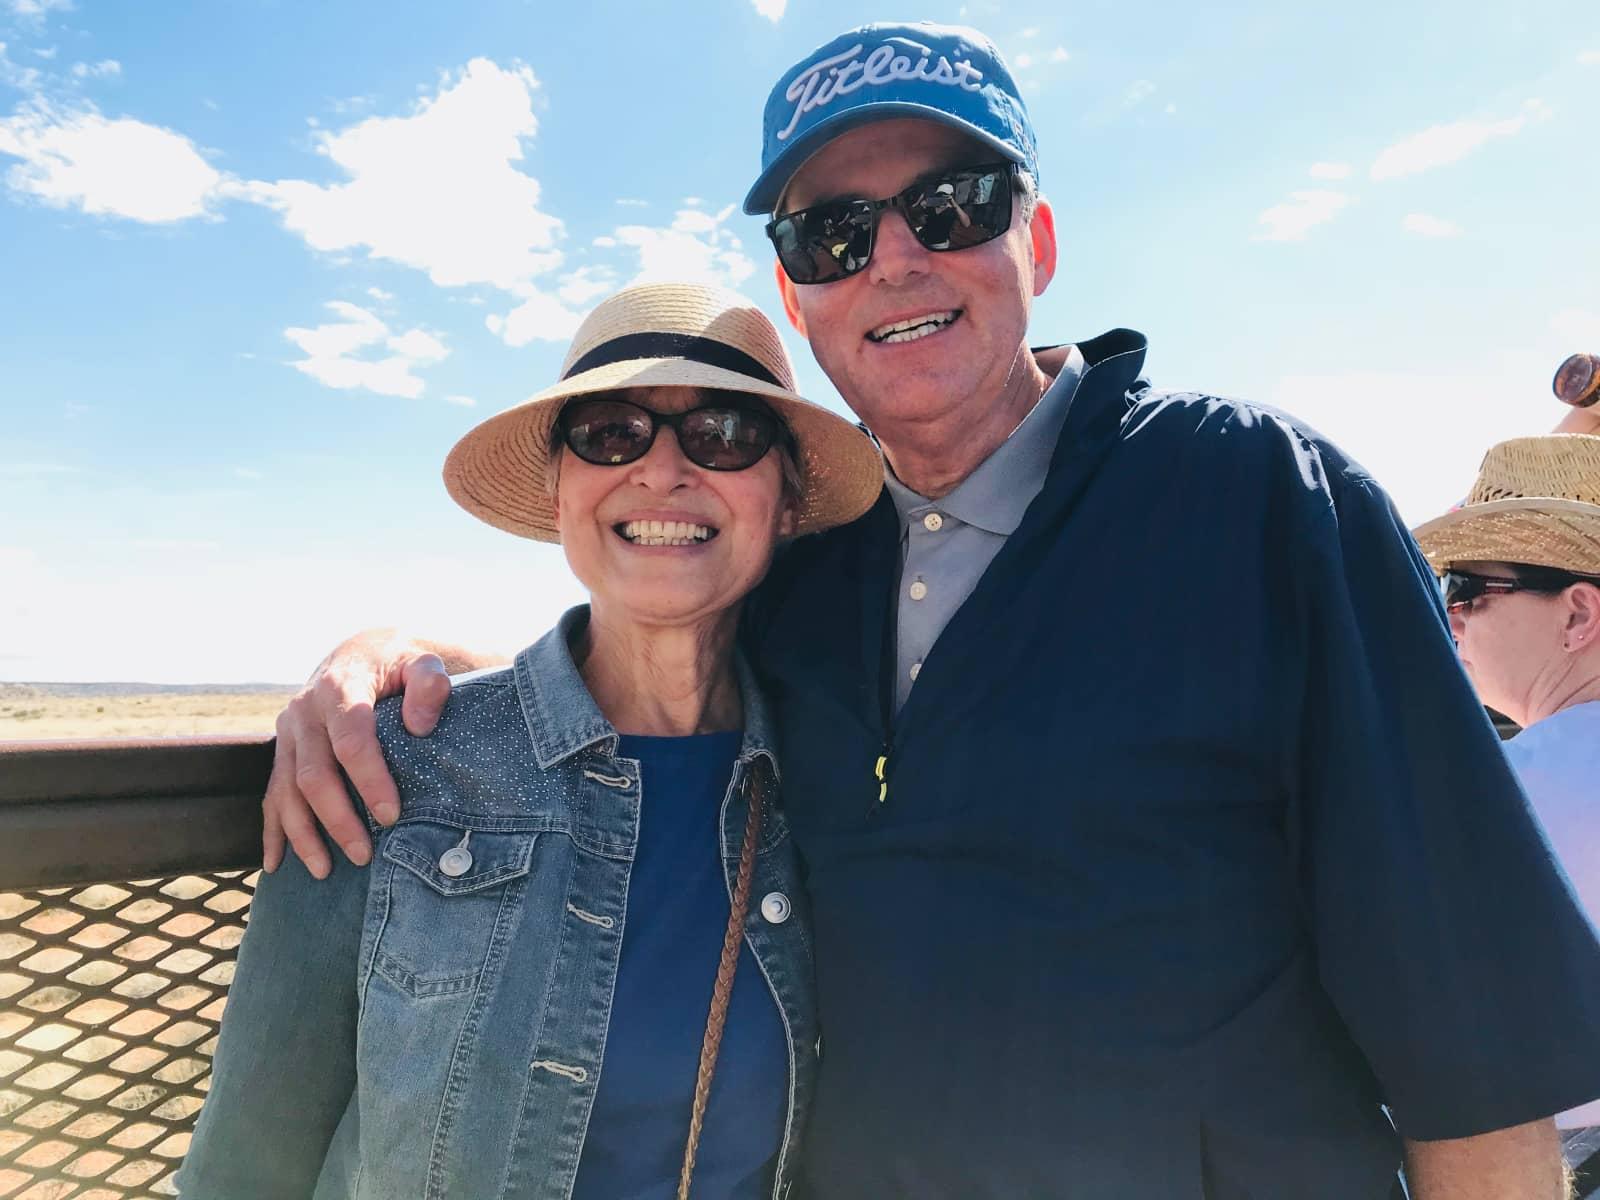 Darlene & John from Regina, Saskatchewan, Canada